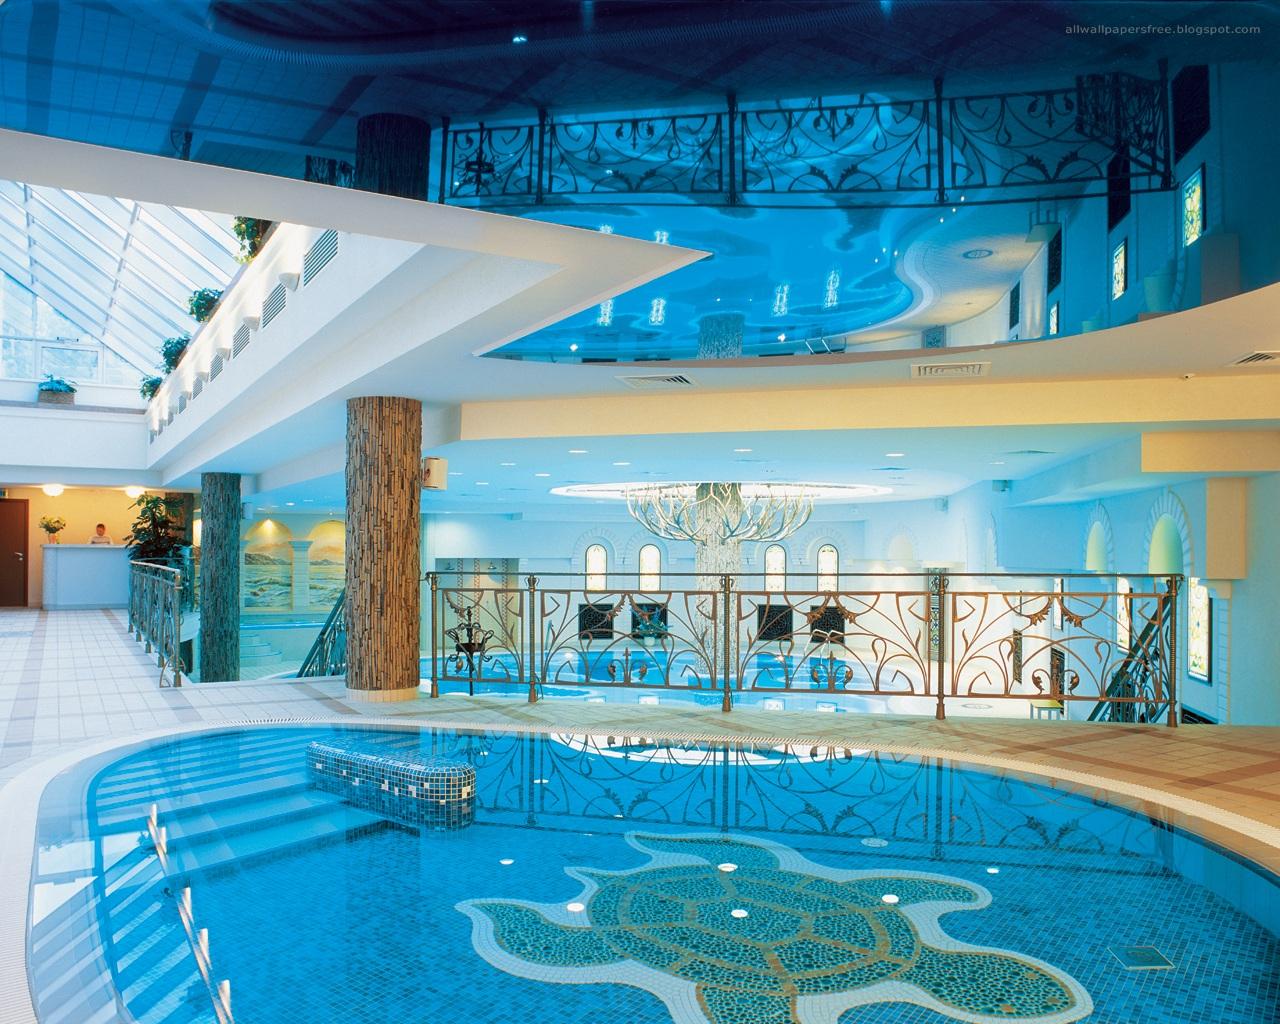 Hotels Interior Design HD [allcoolwallsblogspotcom] Cool Wallpapers 1280x1024